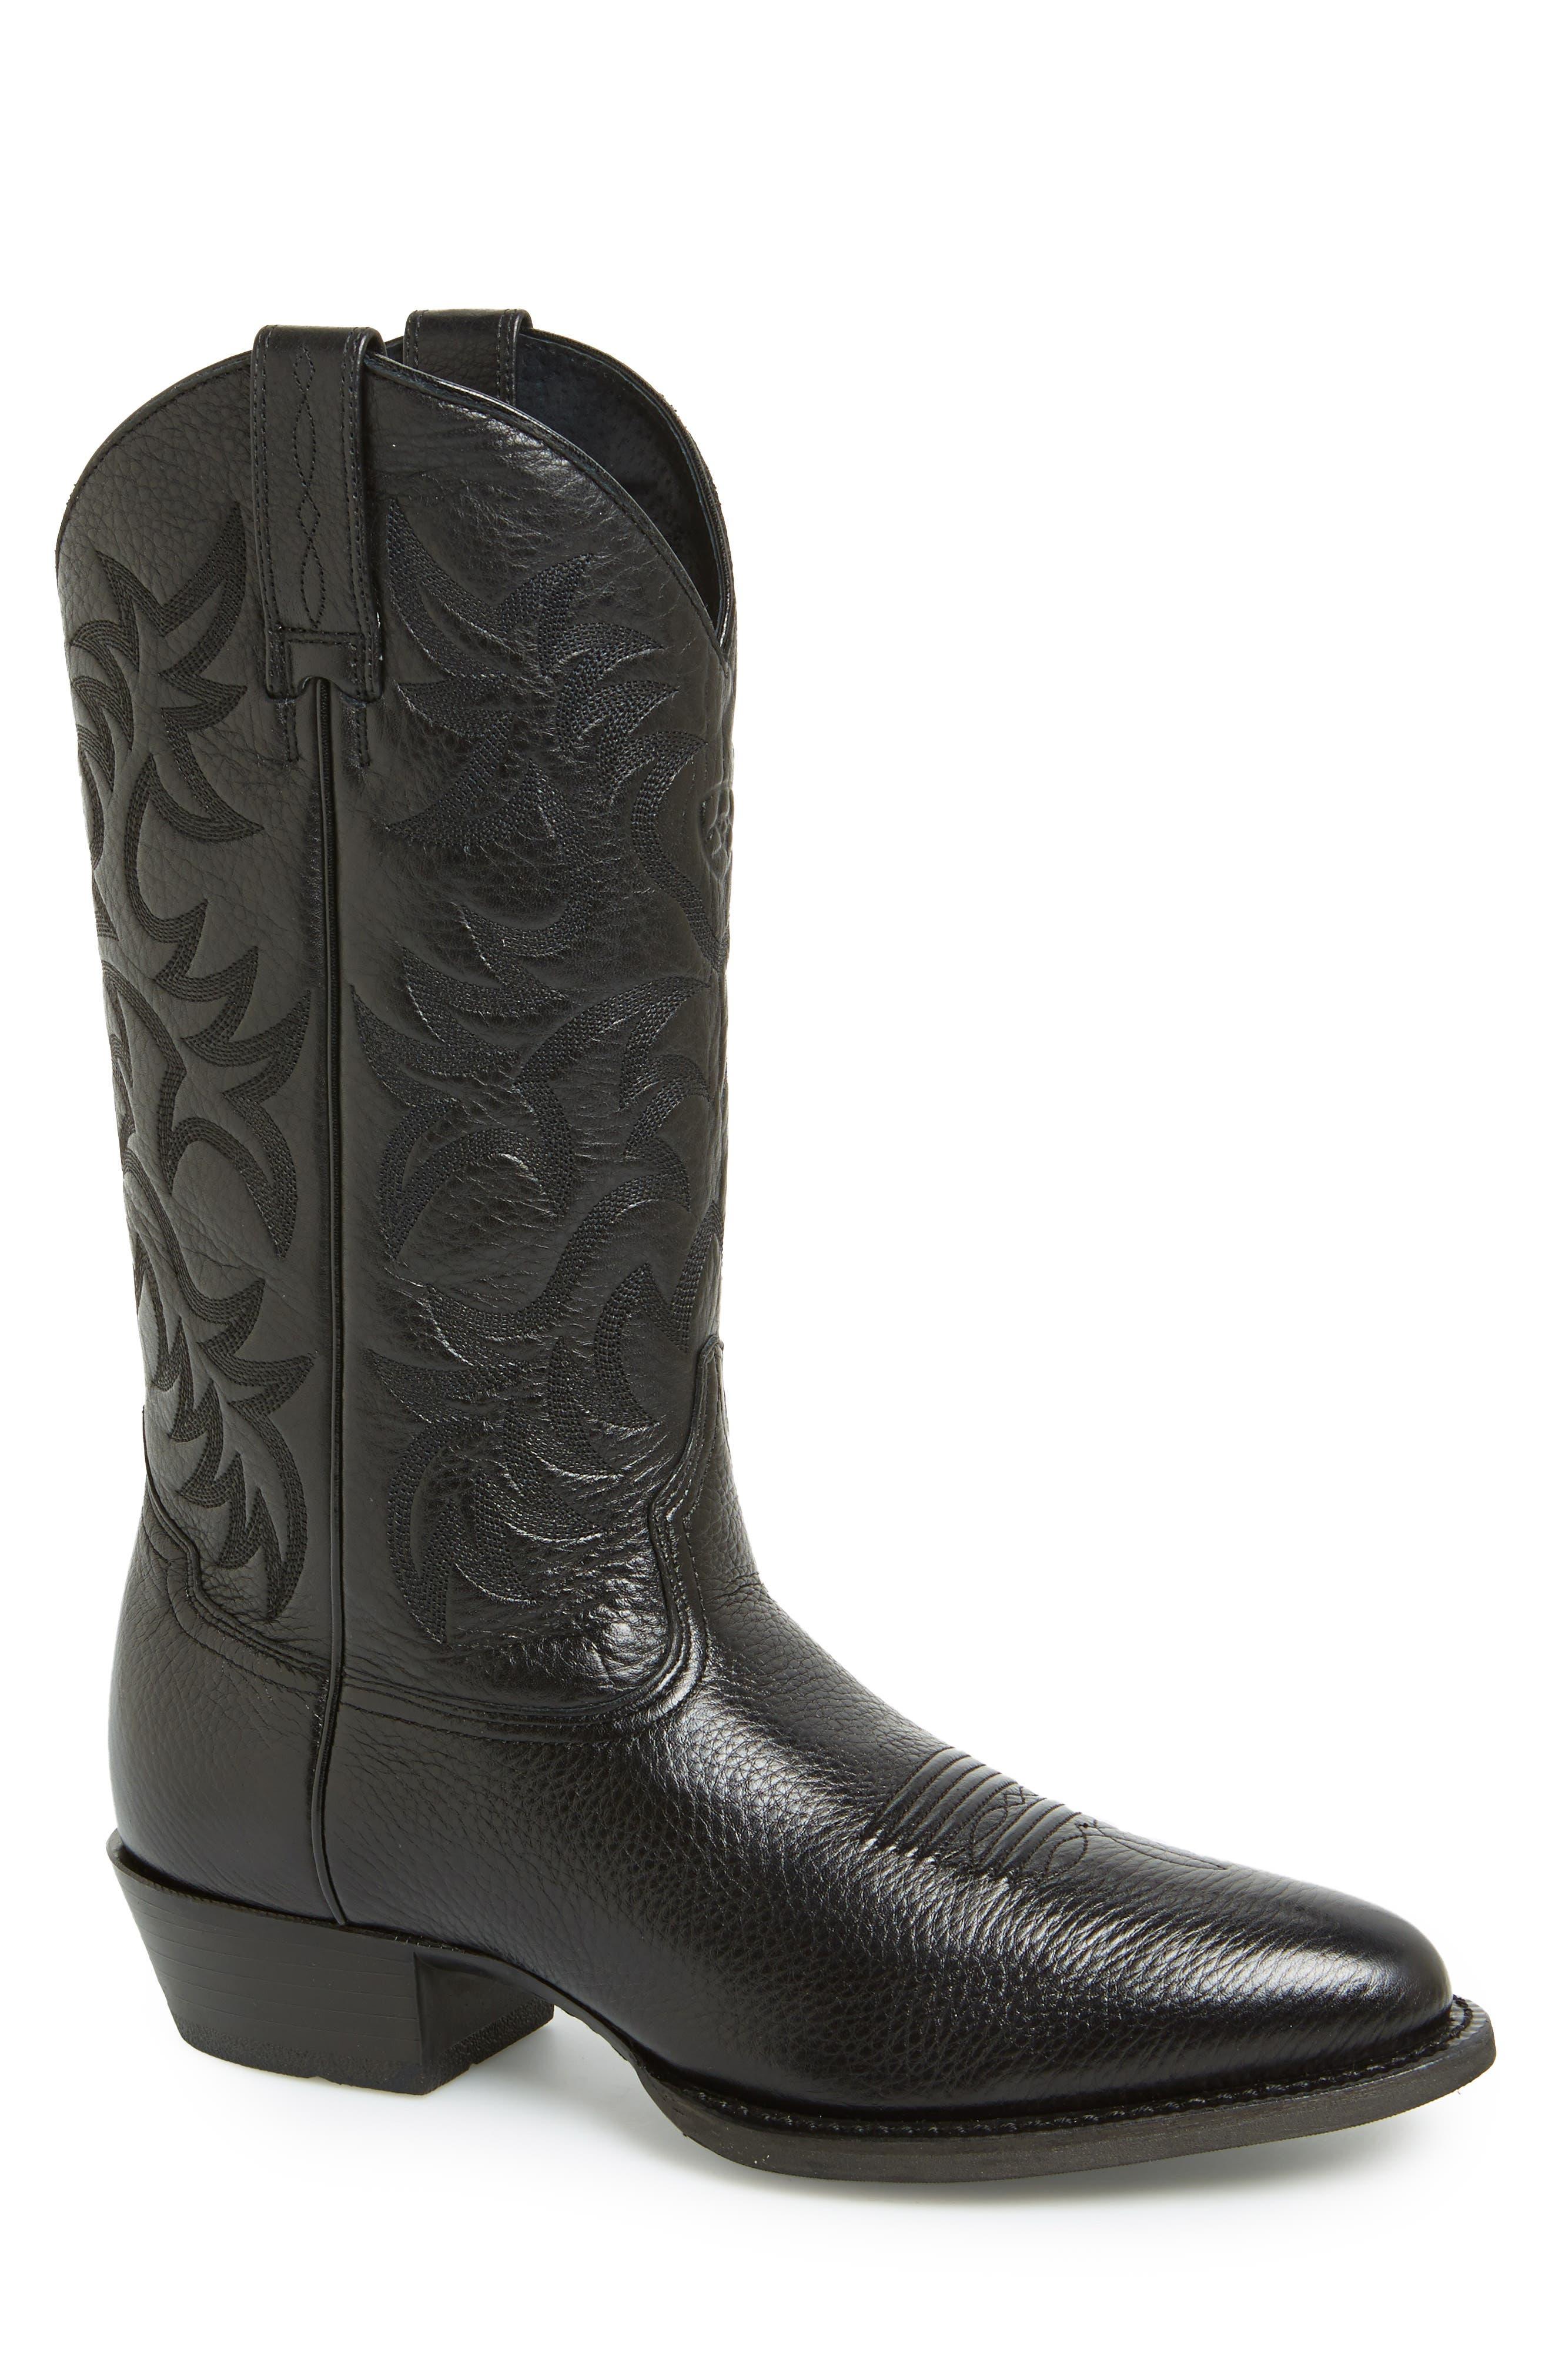 ARIAT, 'Heritage' Leather Cowboy R-Toe Boot, Alternate thumbnail 4, color, BLACK DEERTAN